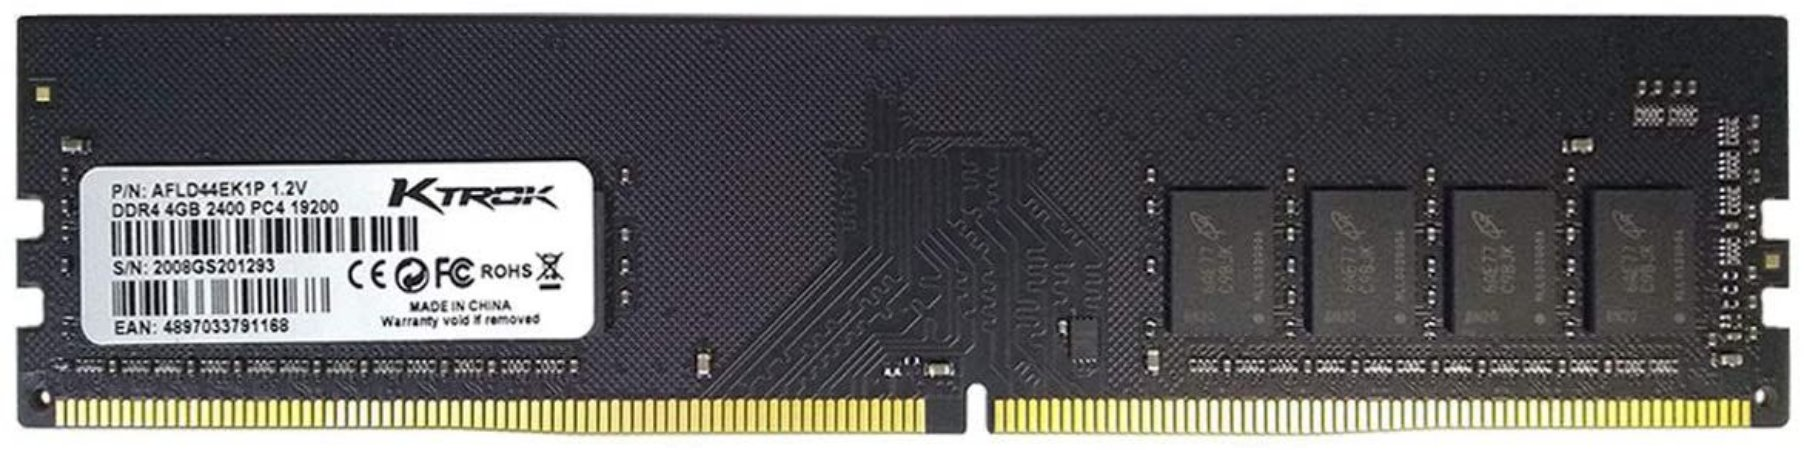 MEMORIA AFOX 4GB DDR 4 2400mhz DIMM AFLD44EK1P